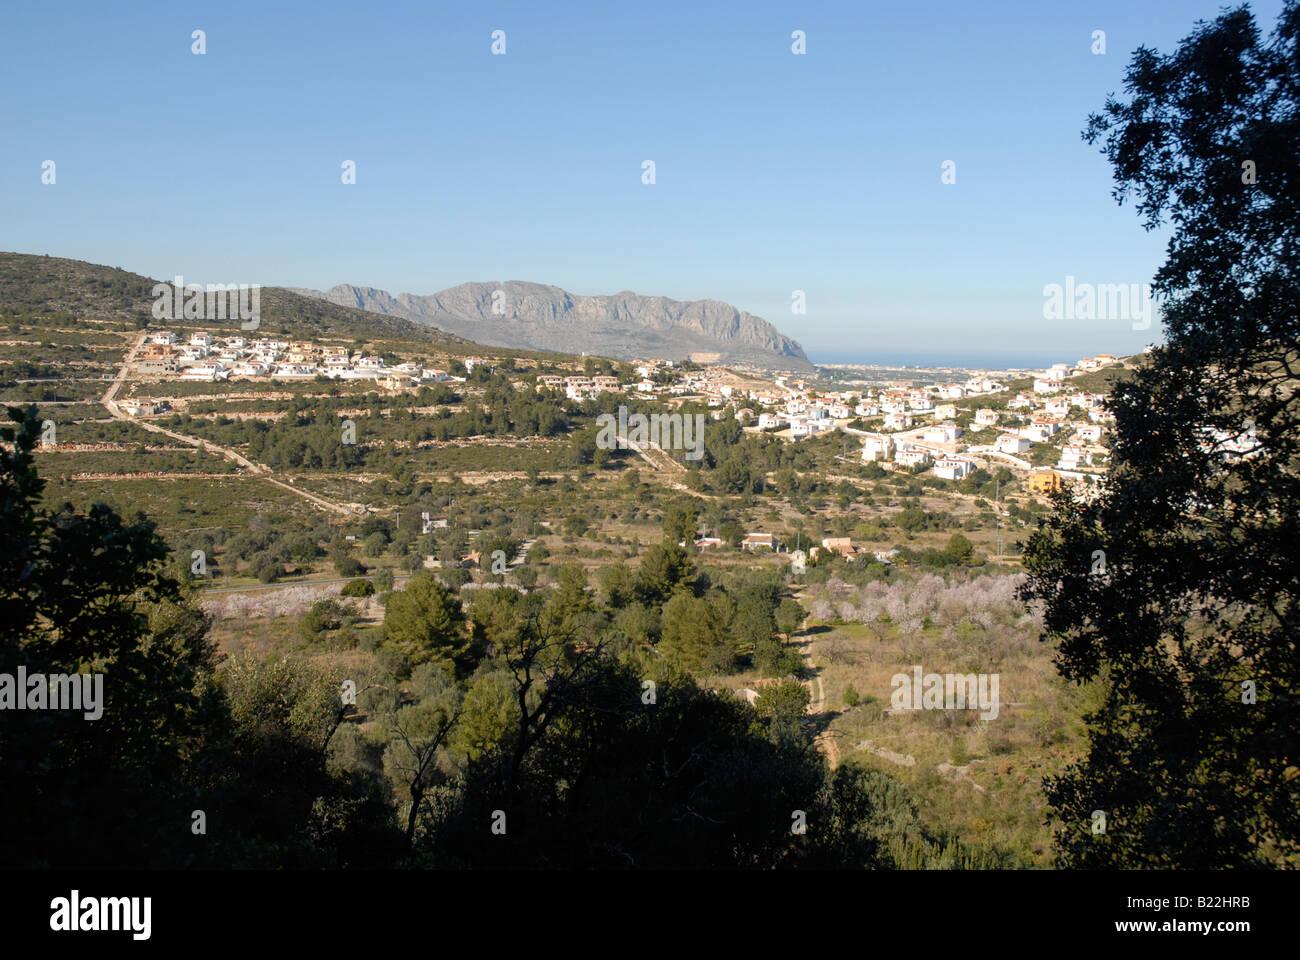 view to new housing development, near Pedreguer, Marina Alta, Alicante province, Spain - Stock Image